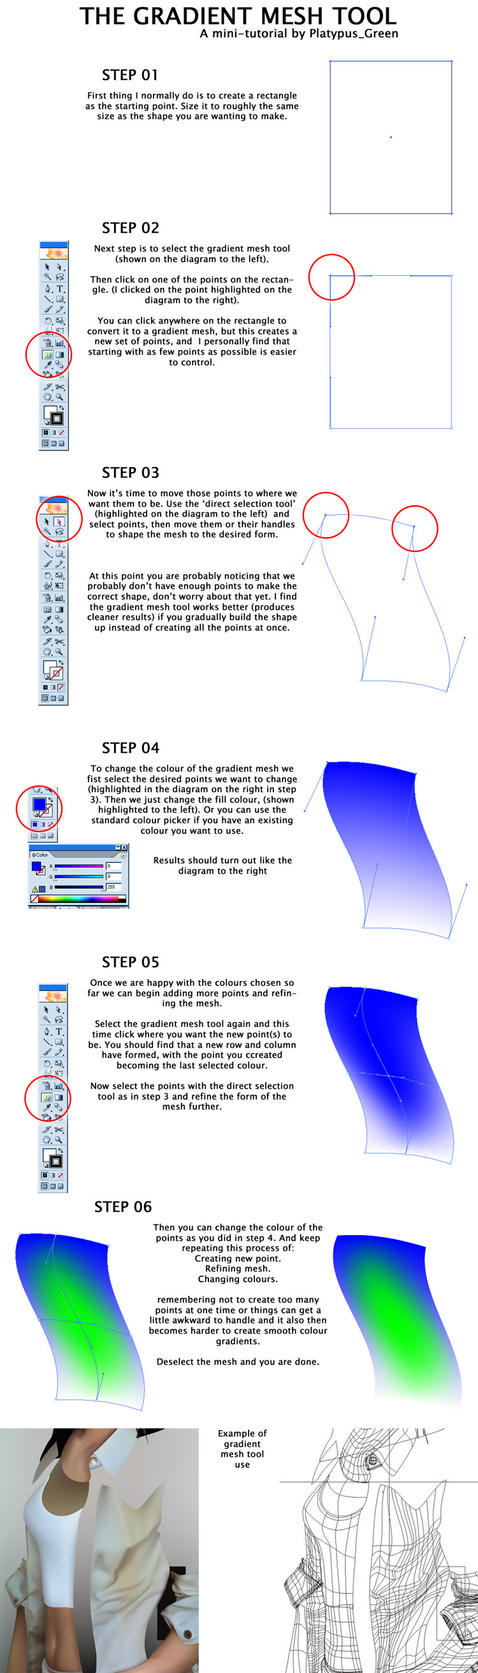 Illustrator gradient mesh by PlatypusGreen